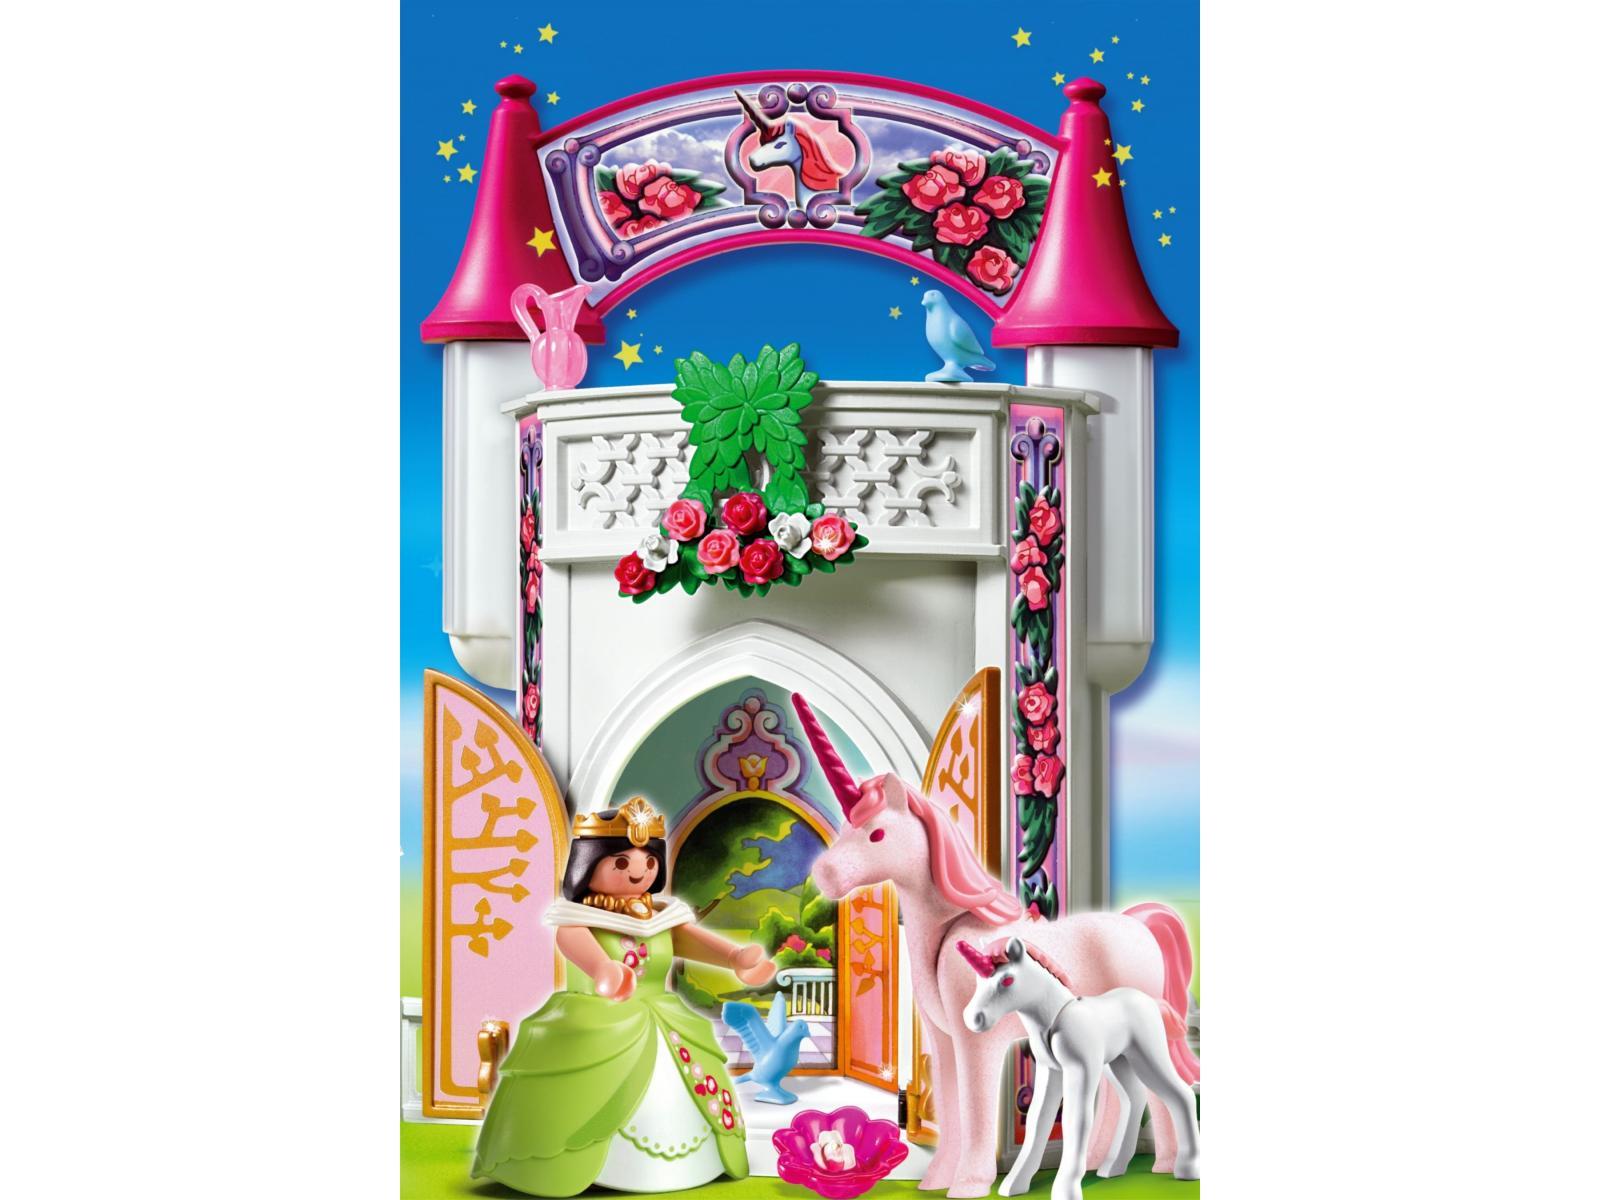 Carrosse princesse playmobil good carrosse princesse for Chateau princesse playmobil 5142